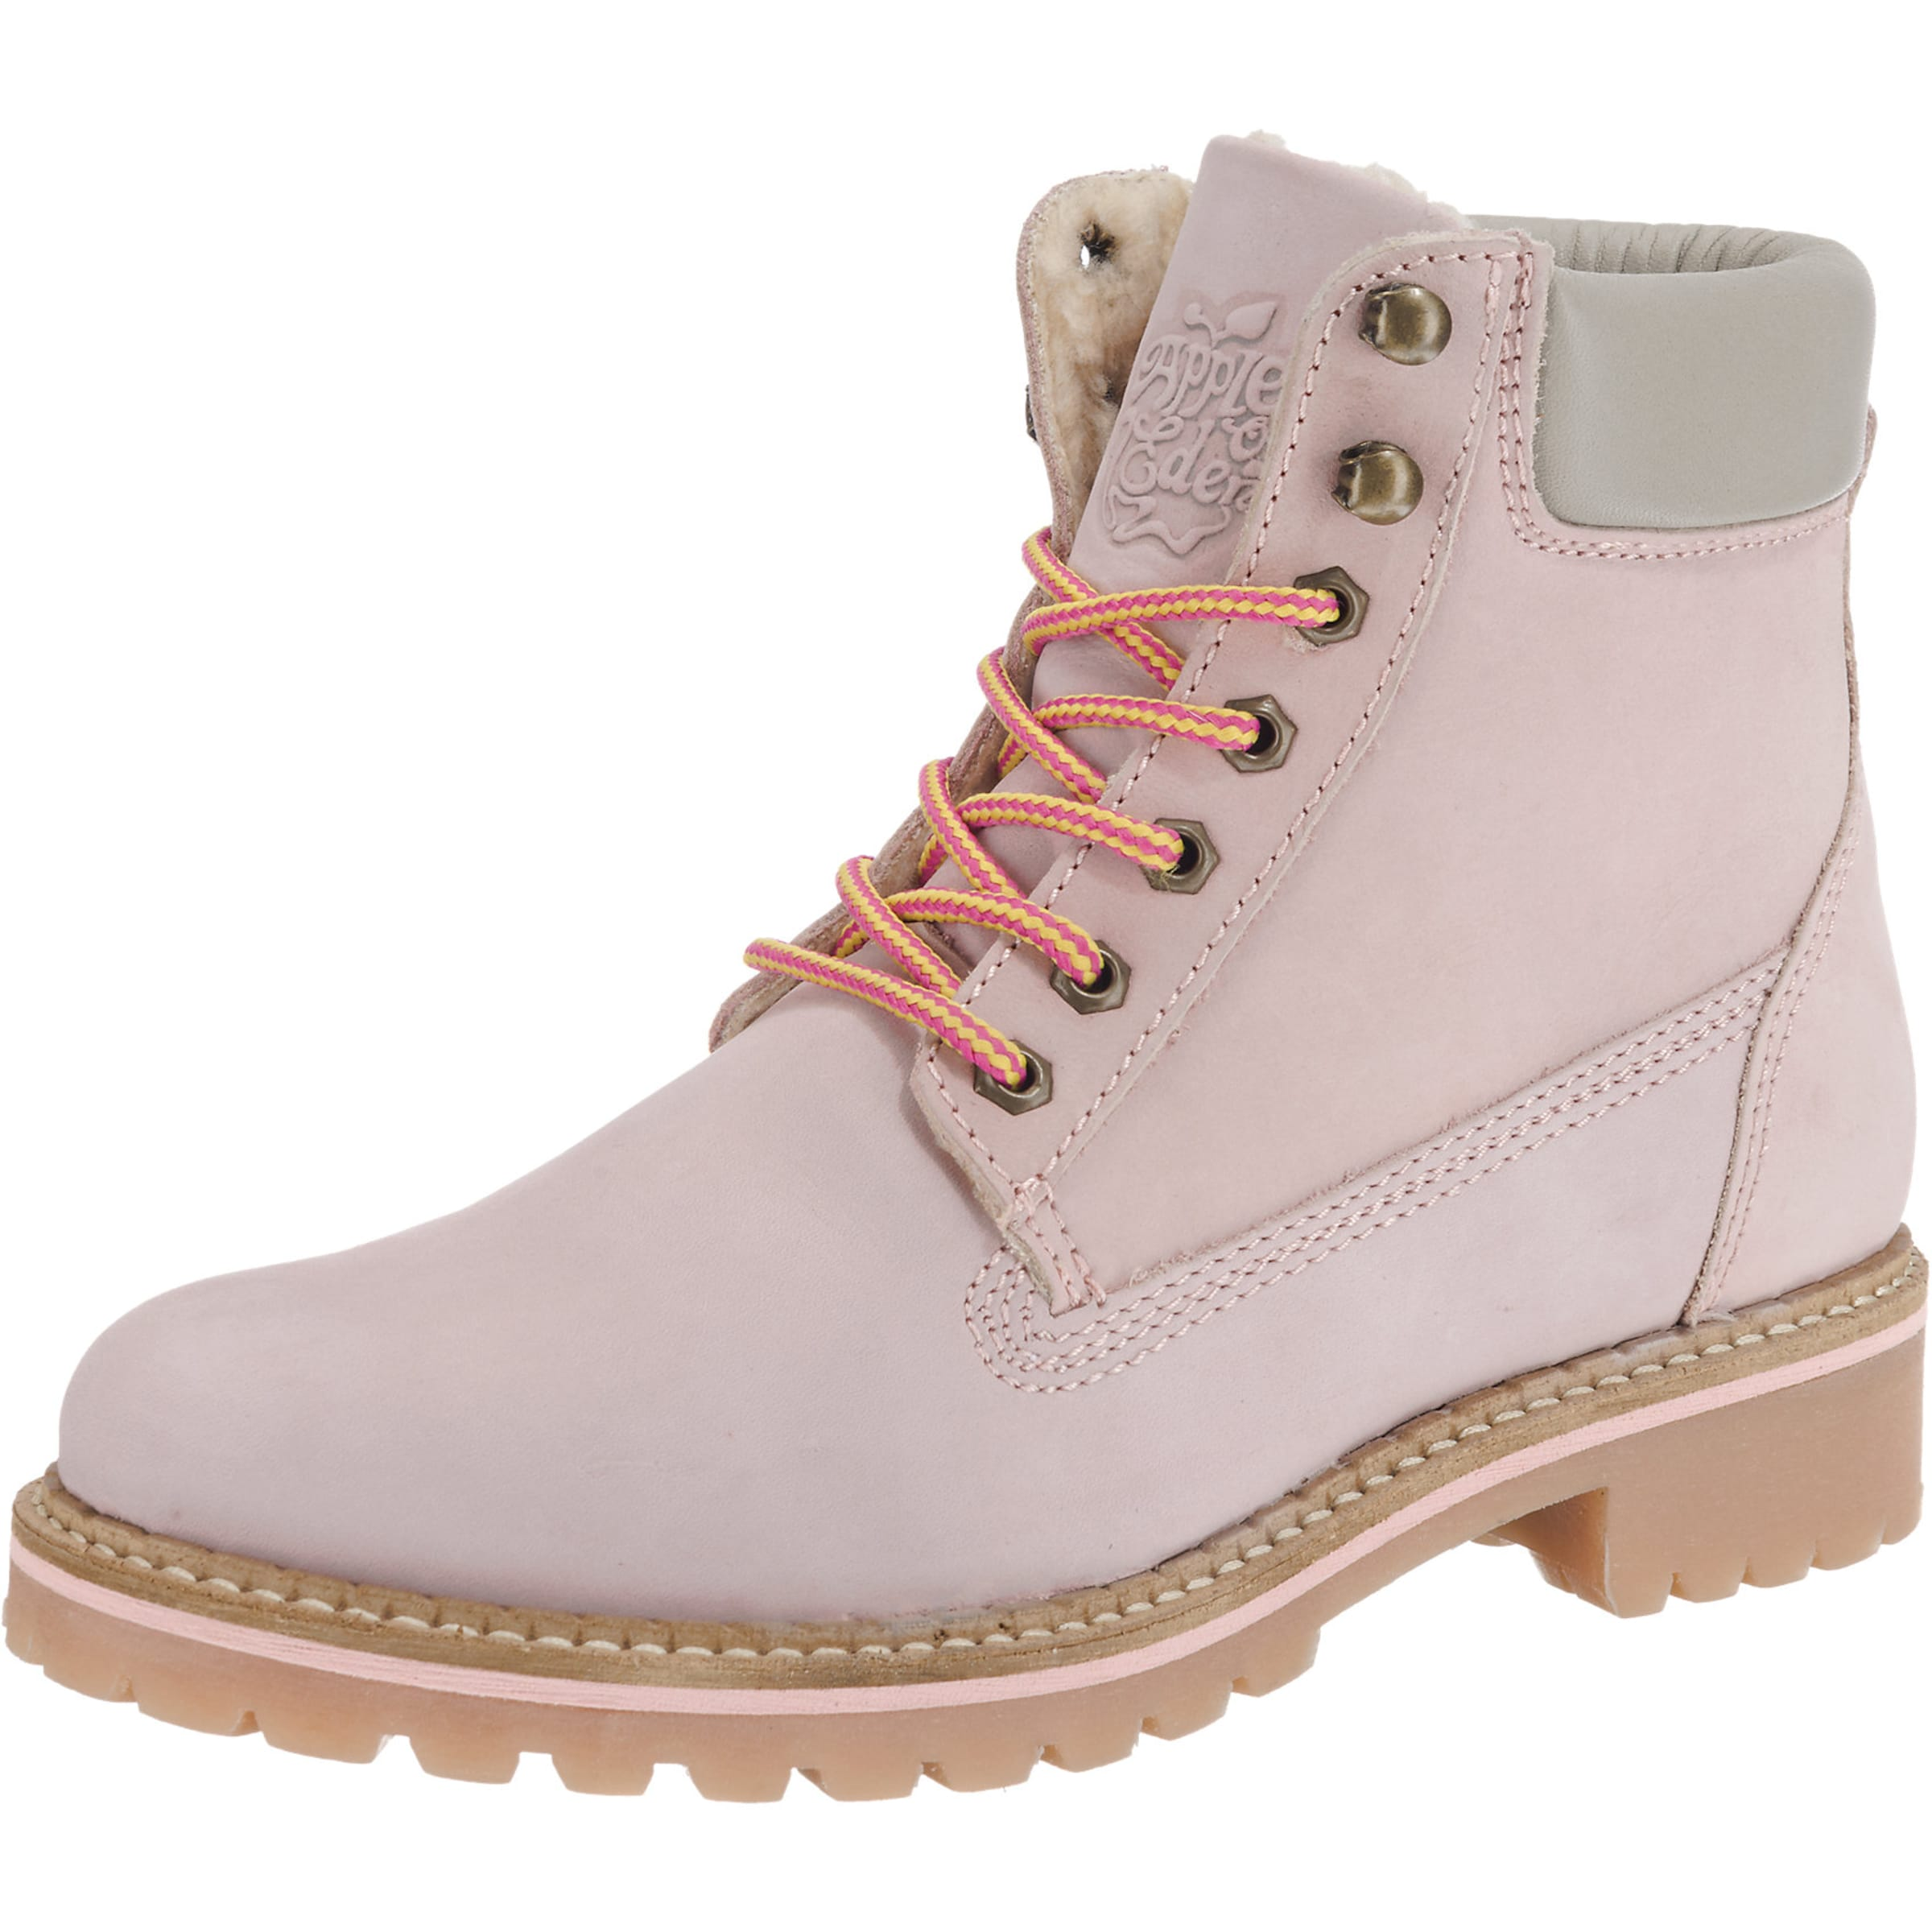 Apple of Eden Star Boots Hohe Qualität